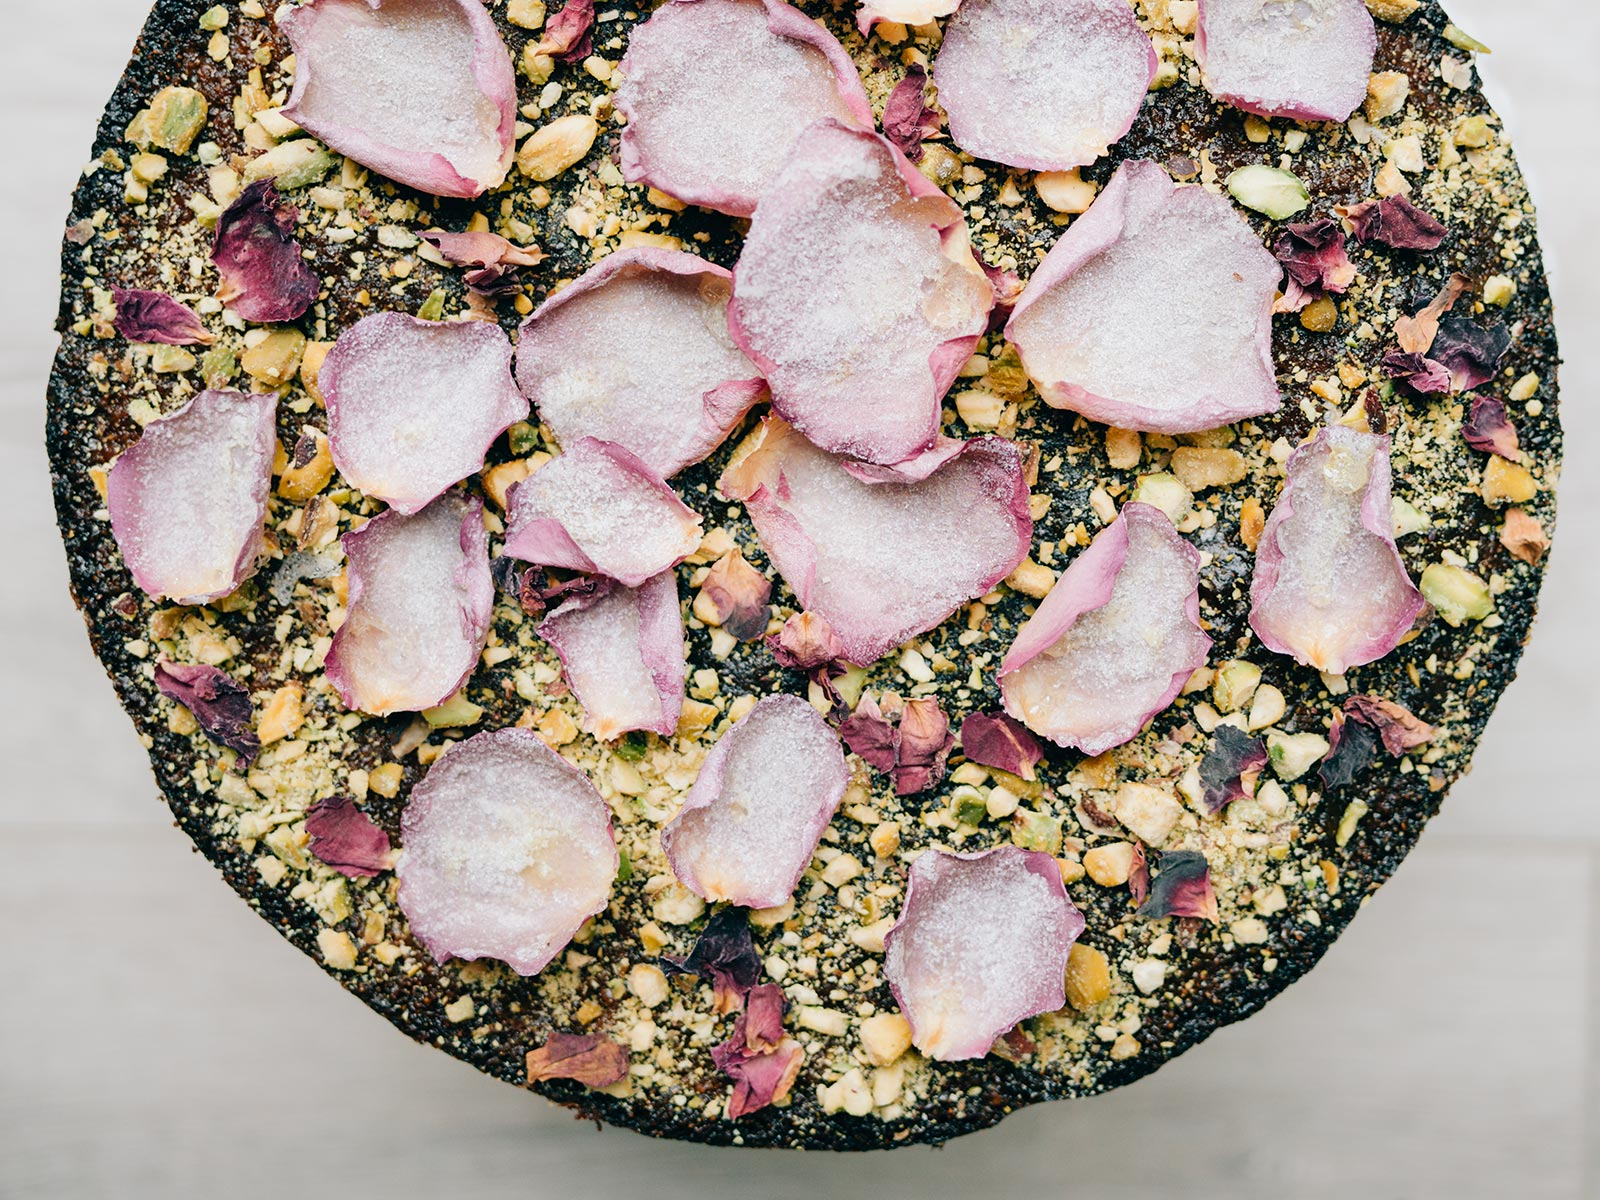 Pistachio & Rose Water Semolina Cake | recipe by Yotam Ottolenghi & Helen Goh